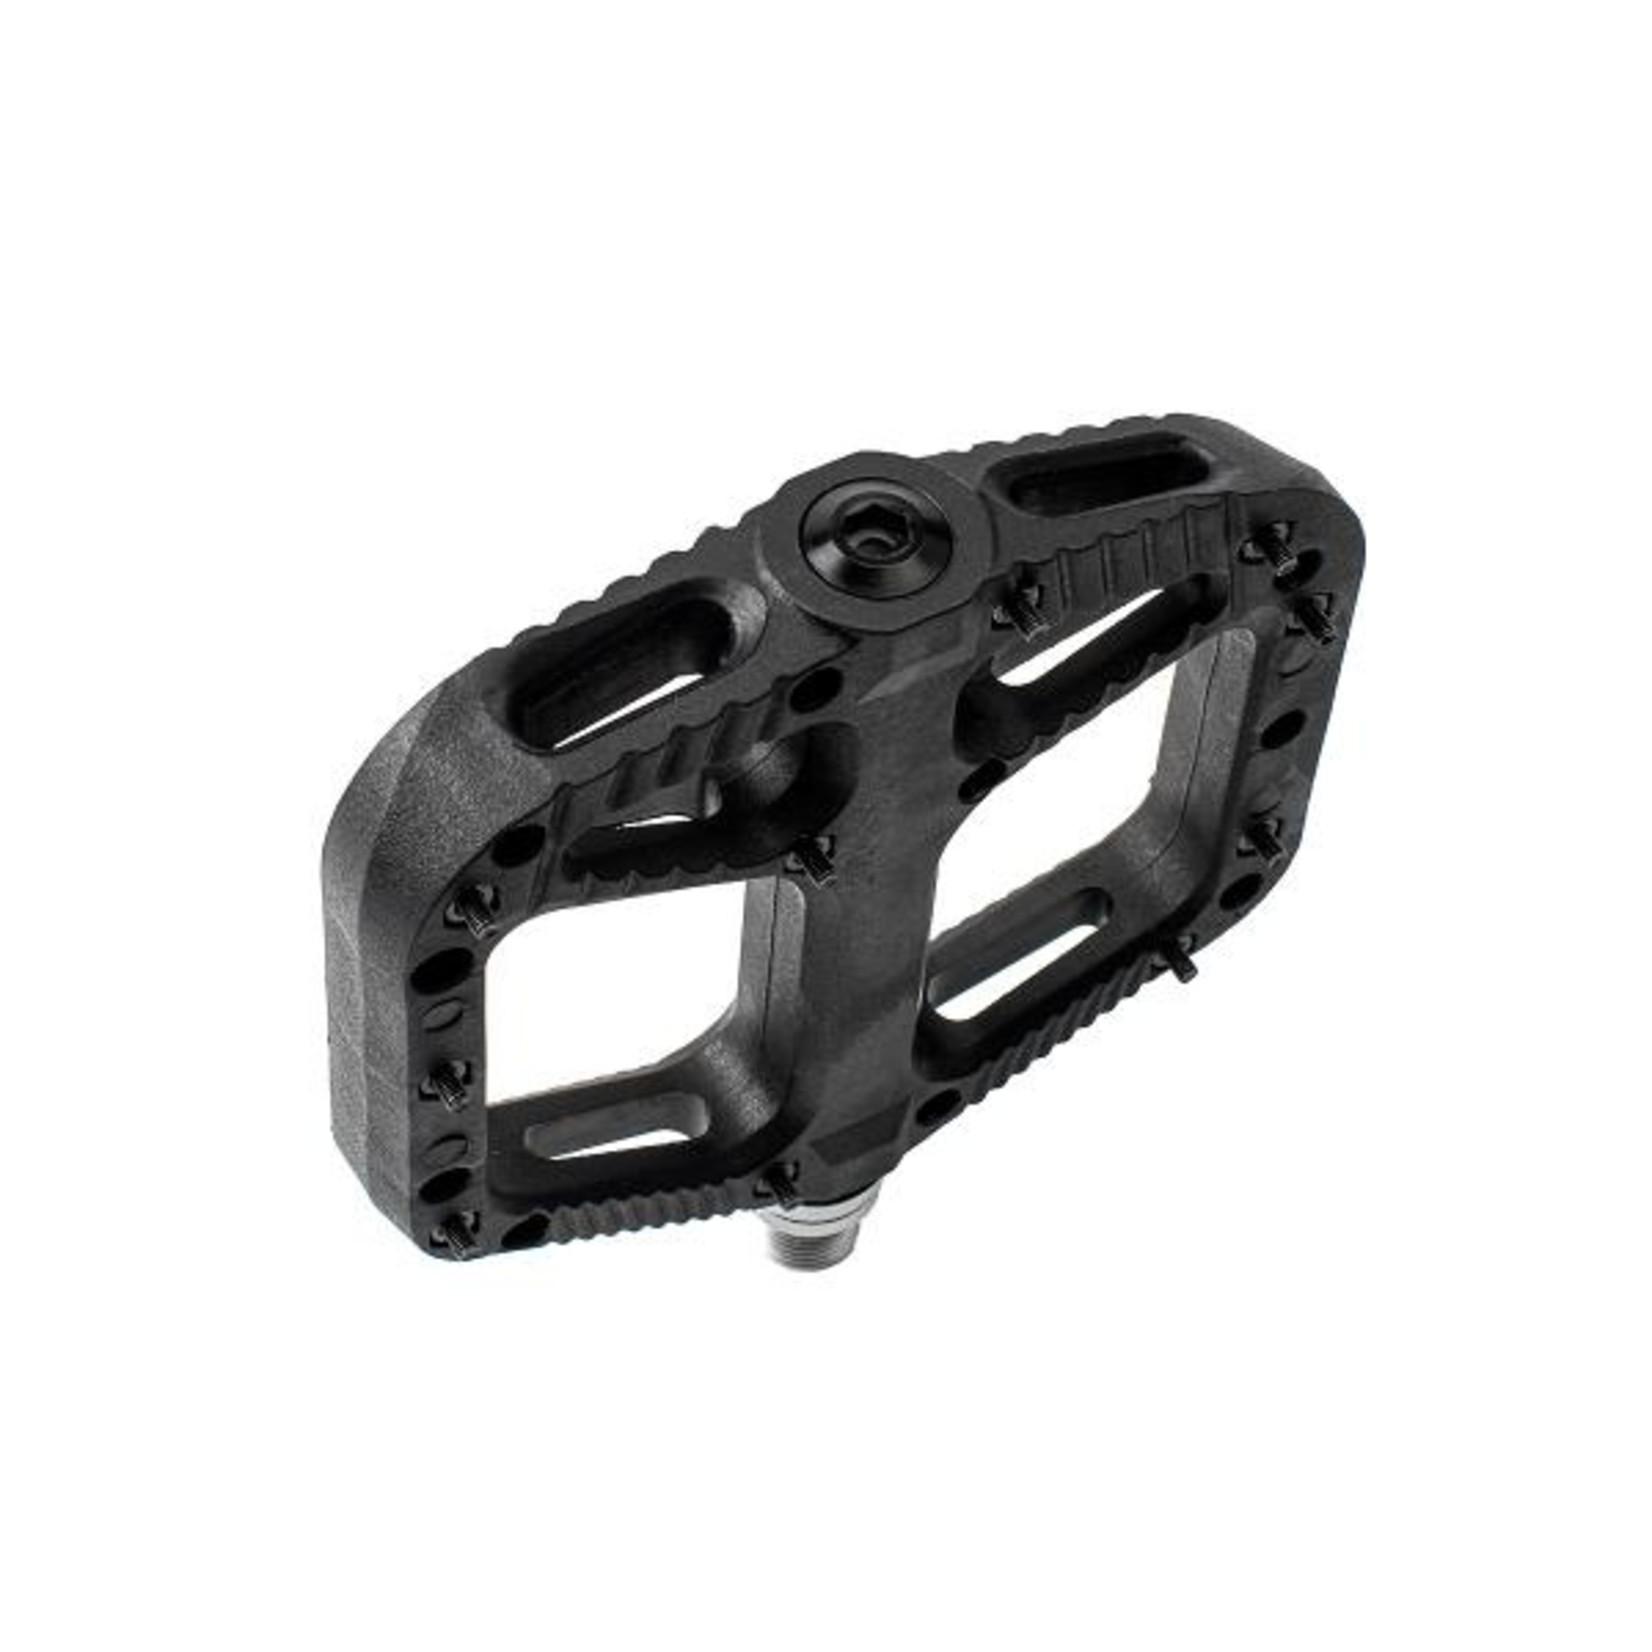 Ryfe Ryfe, Sasquatch Platform Pedal Black